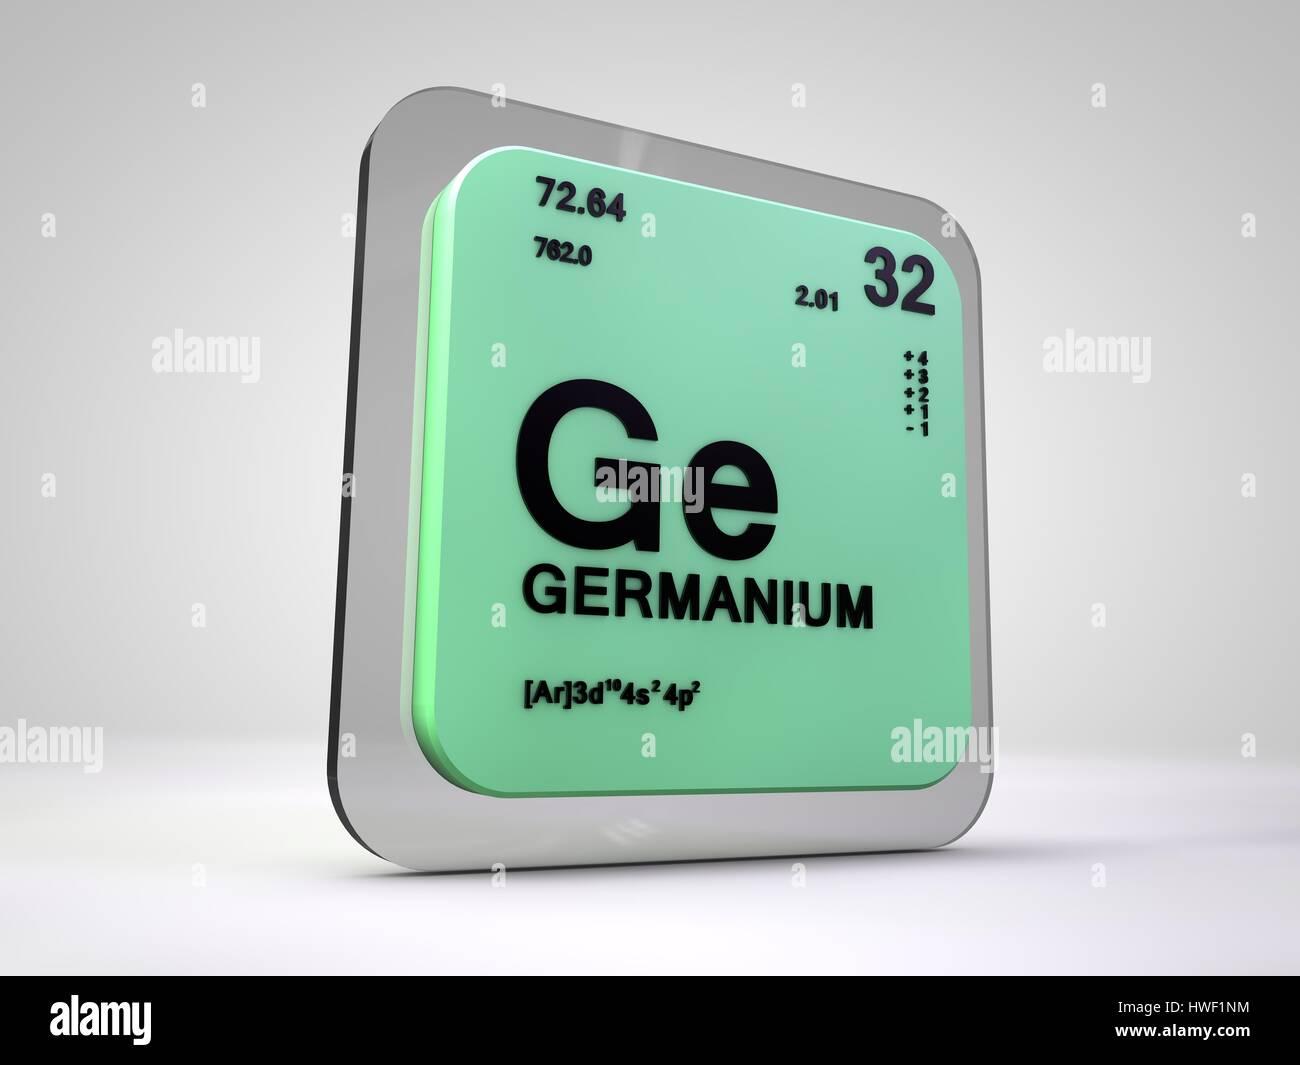 Germanium ge chemical element periodic table 3d render stock germanium ge chemical element periodic table 3d render gamestrikefo Choice Image